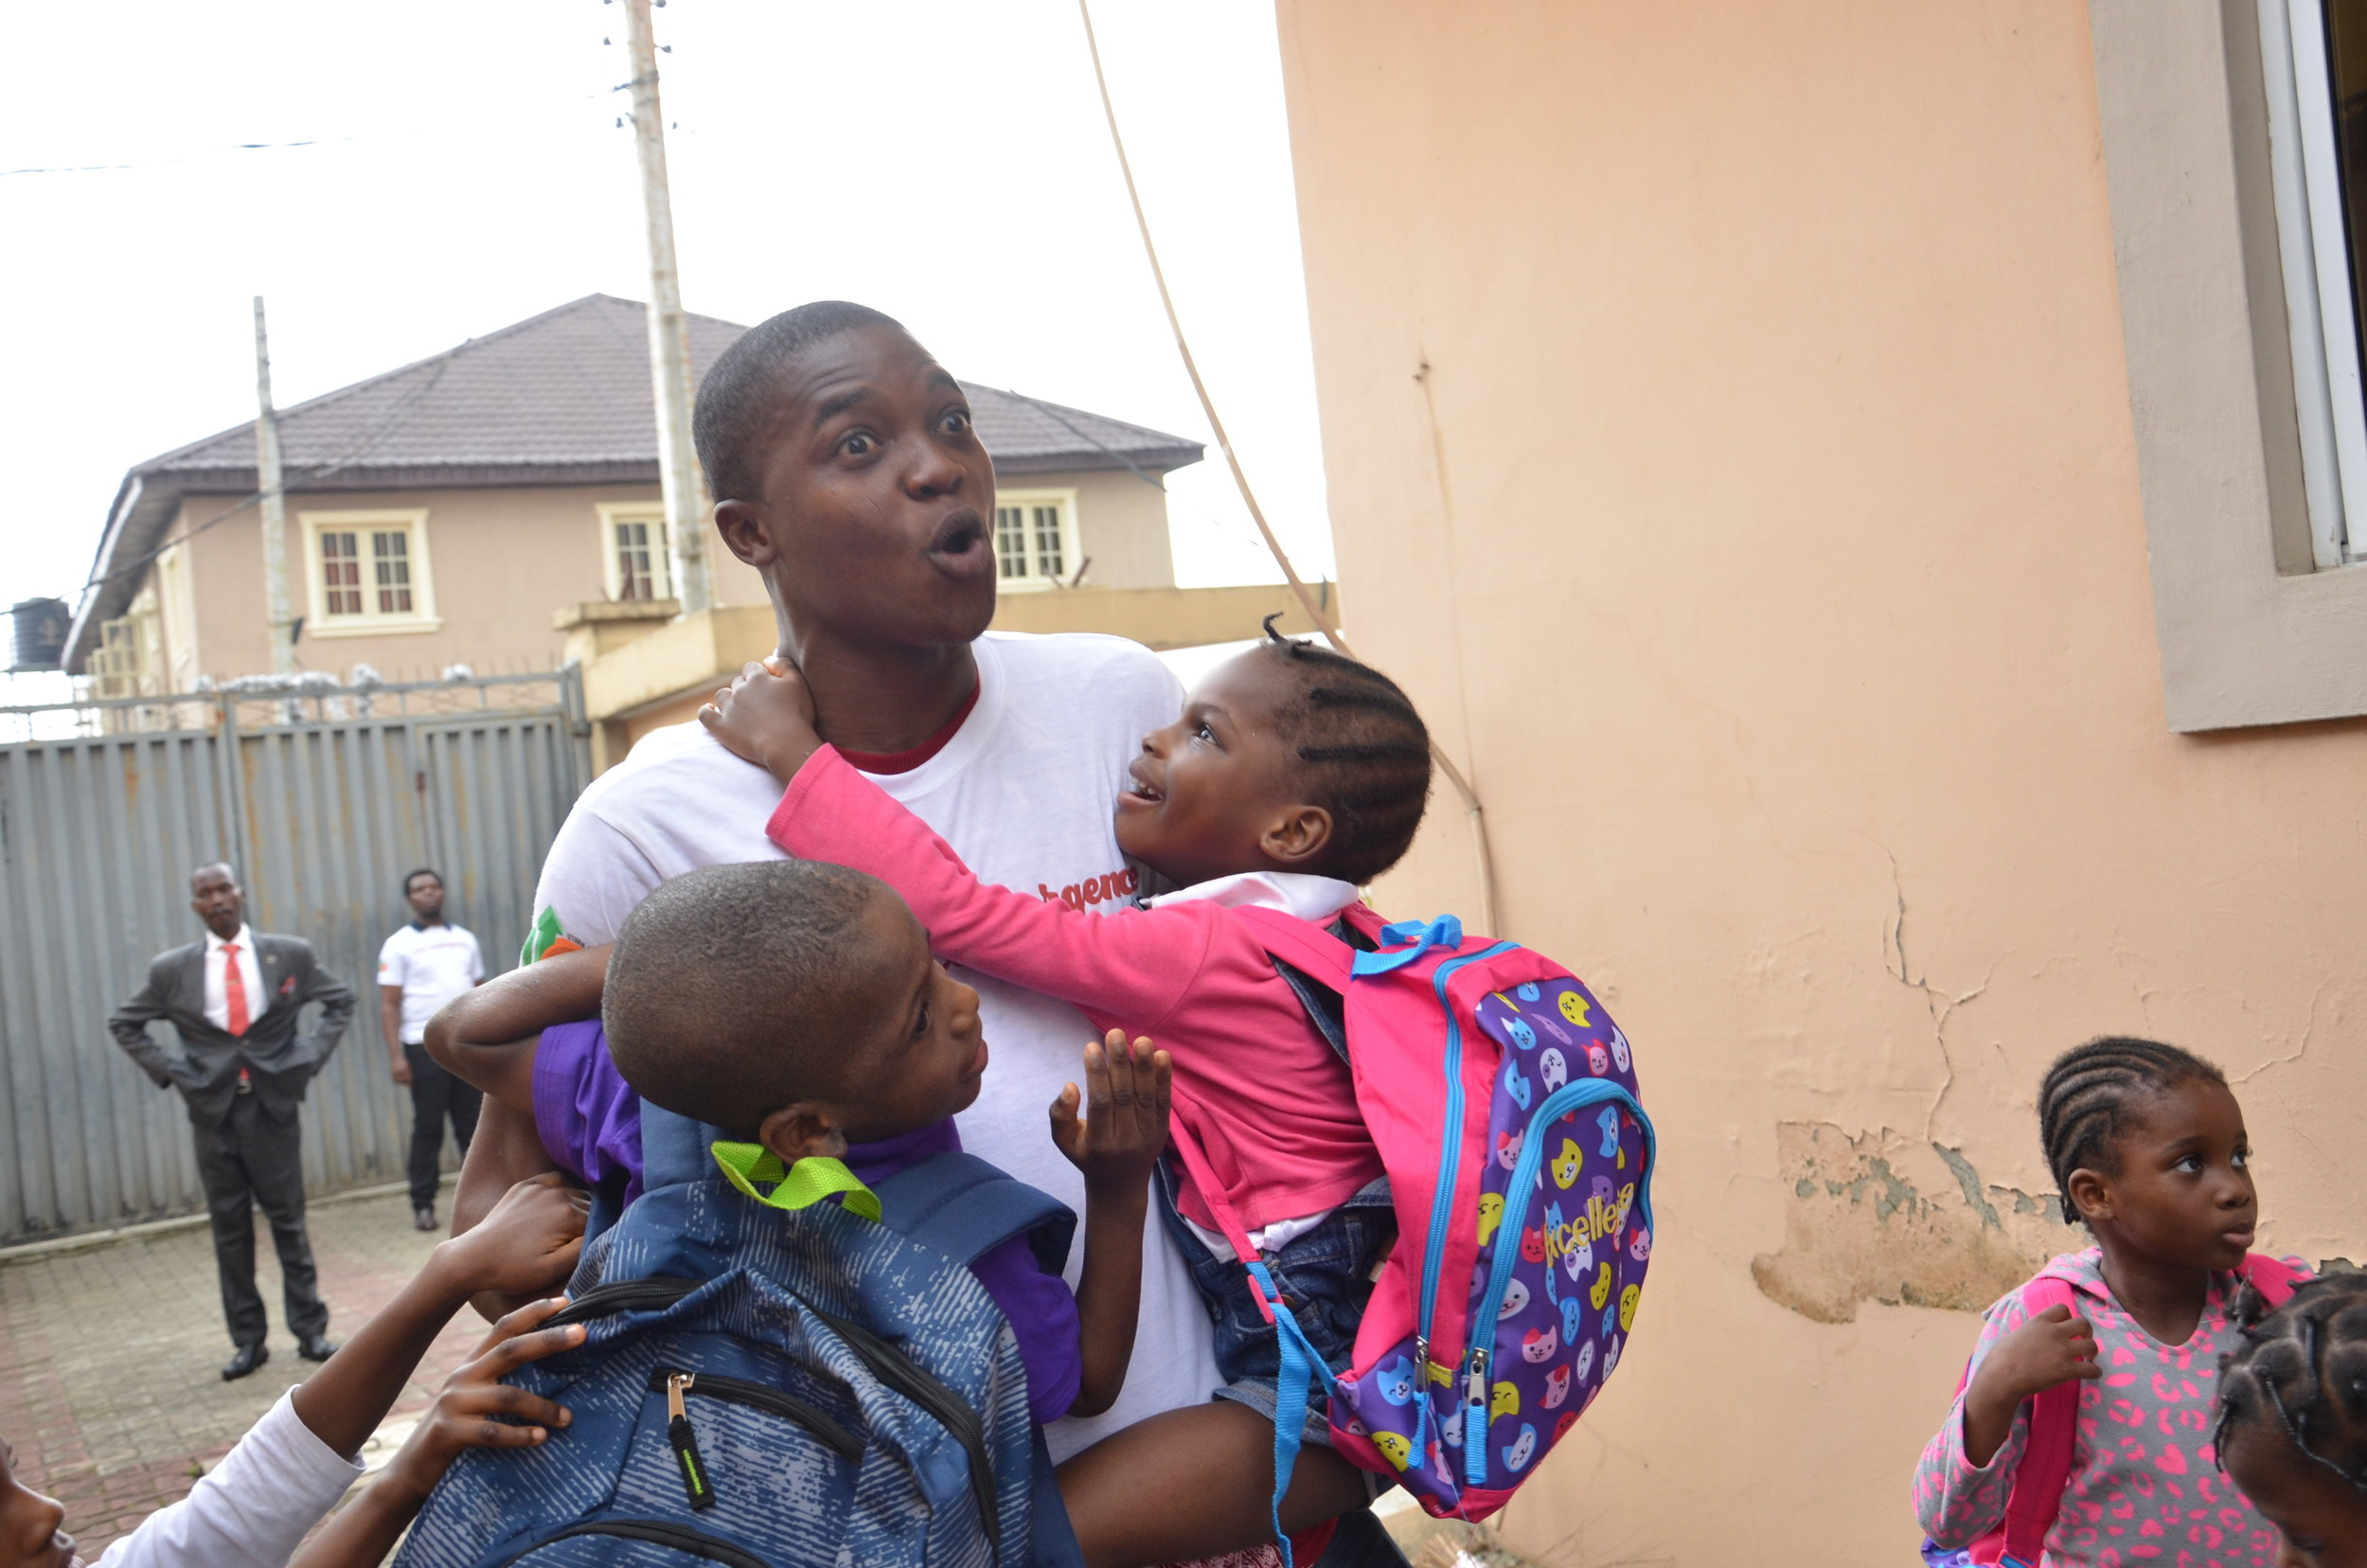 Grateful & very happy constituents :). Orpahange children hugging a volunteer after receiving gifts.